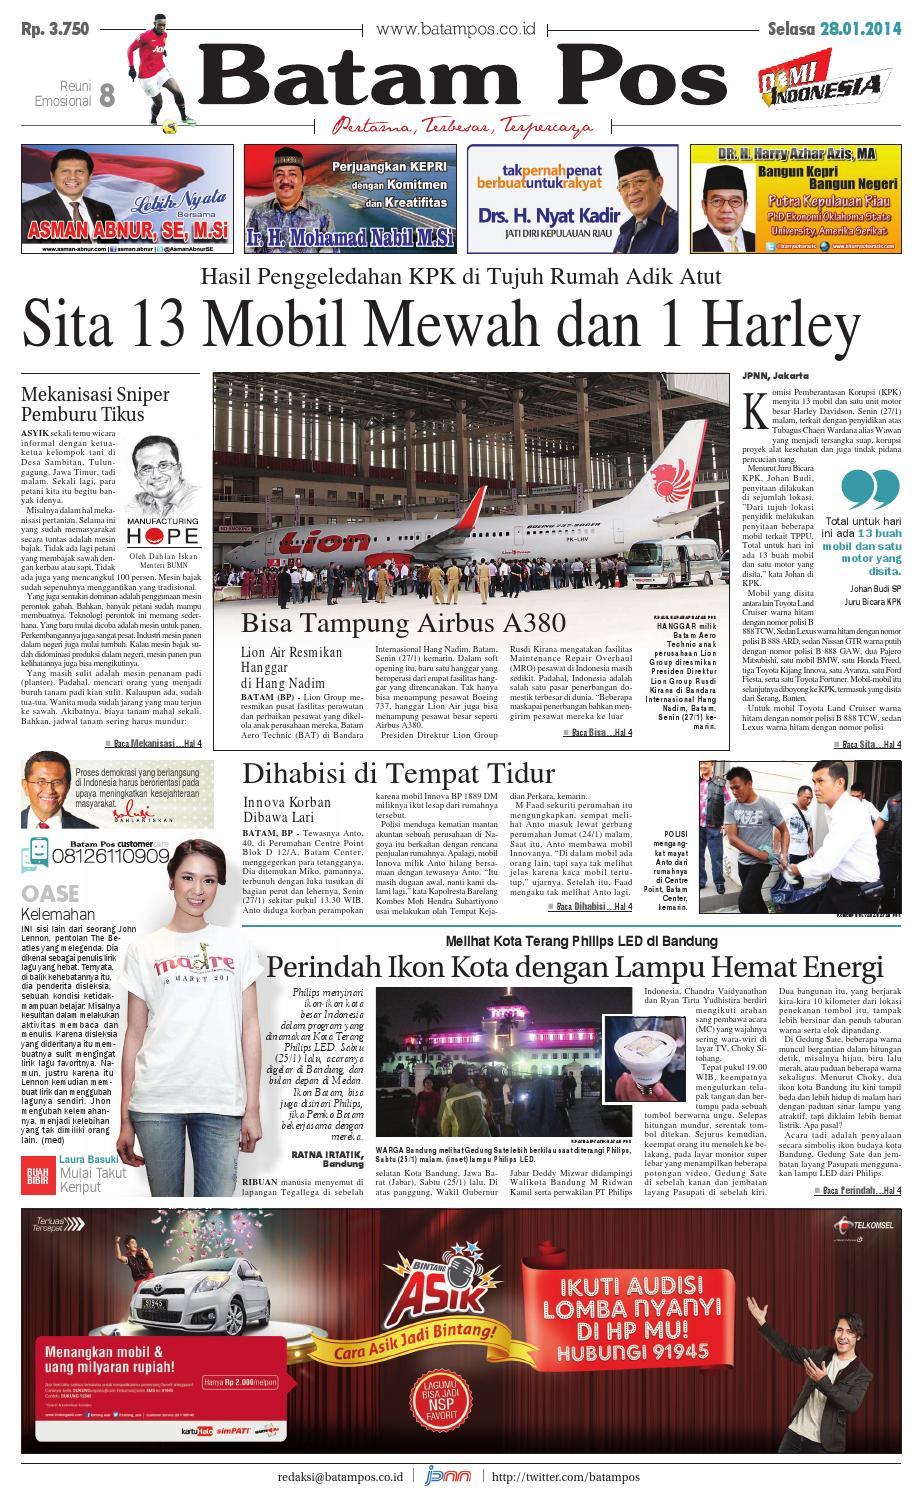 28 Januari 2014 by Batampos Newspaper - issuu dceddd5d30